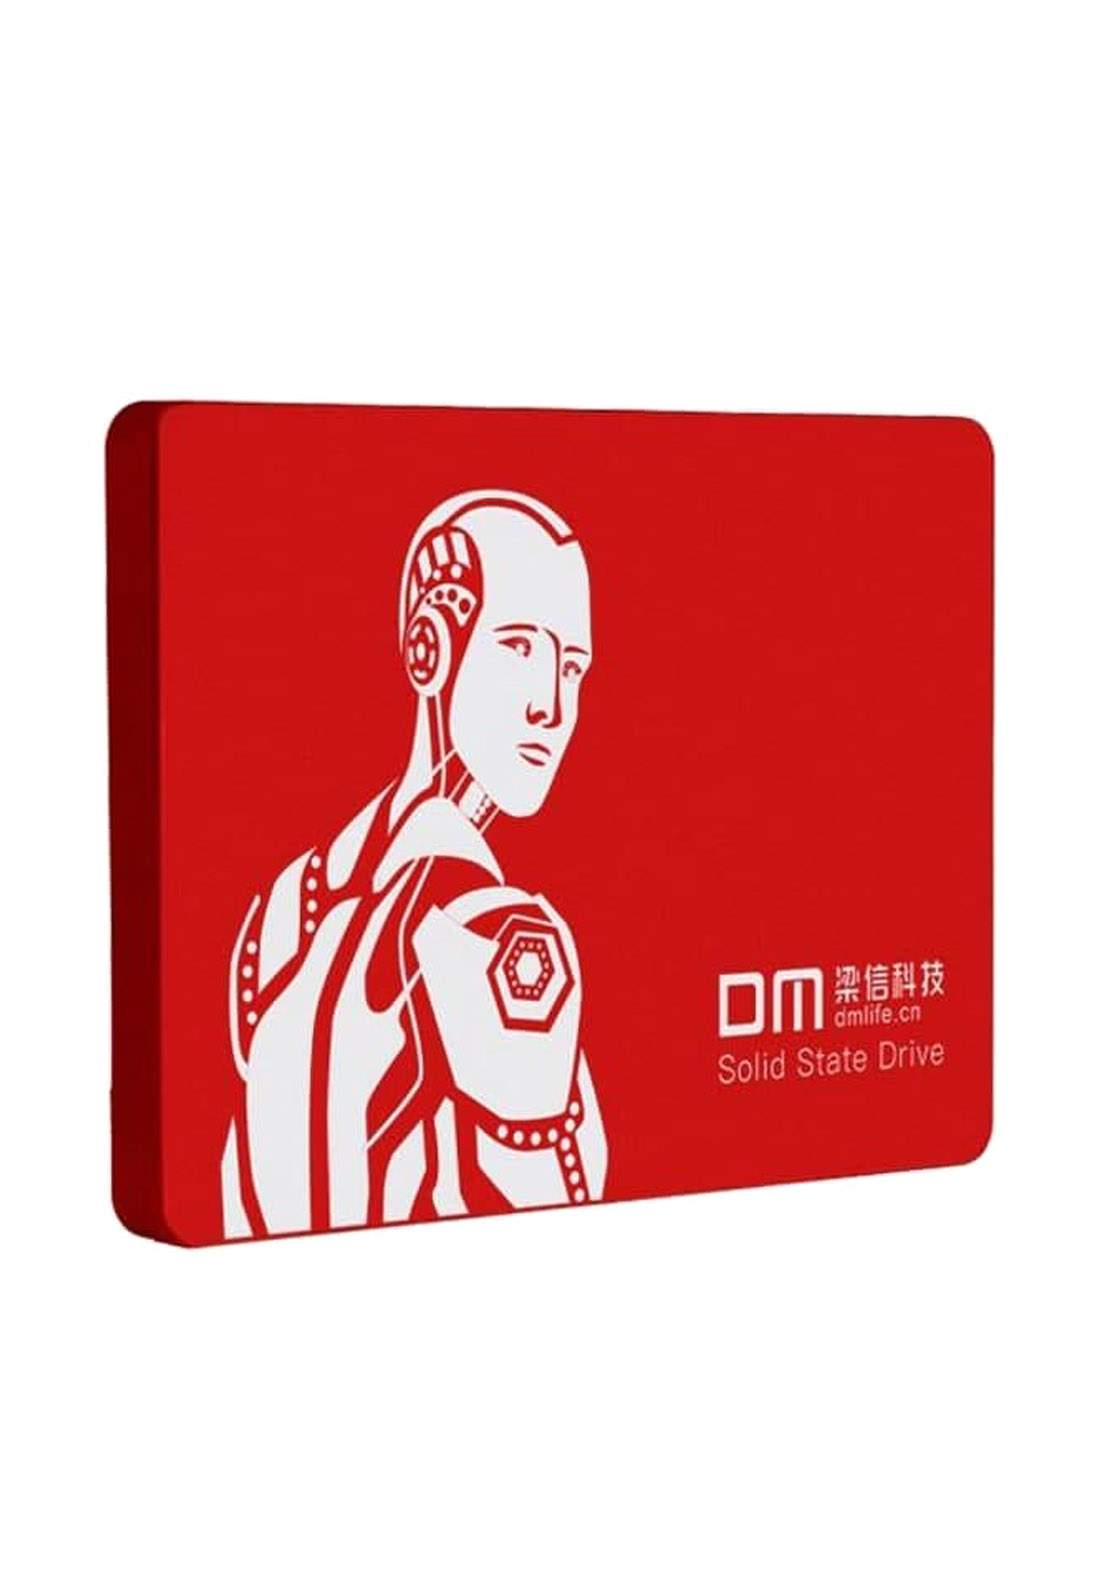 DM F550 240GB 2.5 inch Internal Solid State Drive SSD - Red هارد داخلي